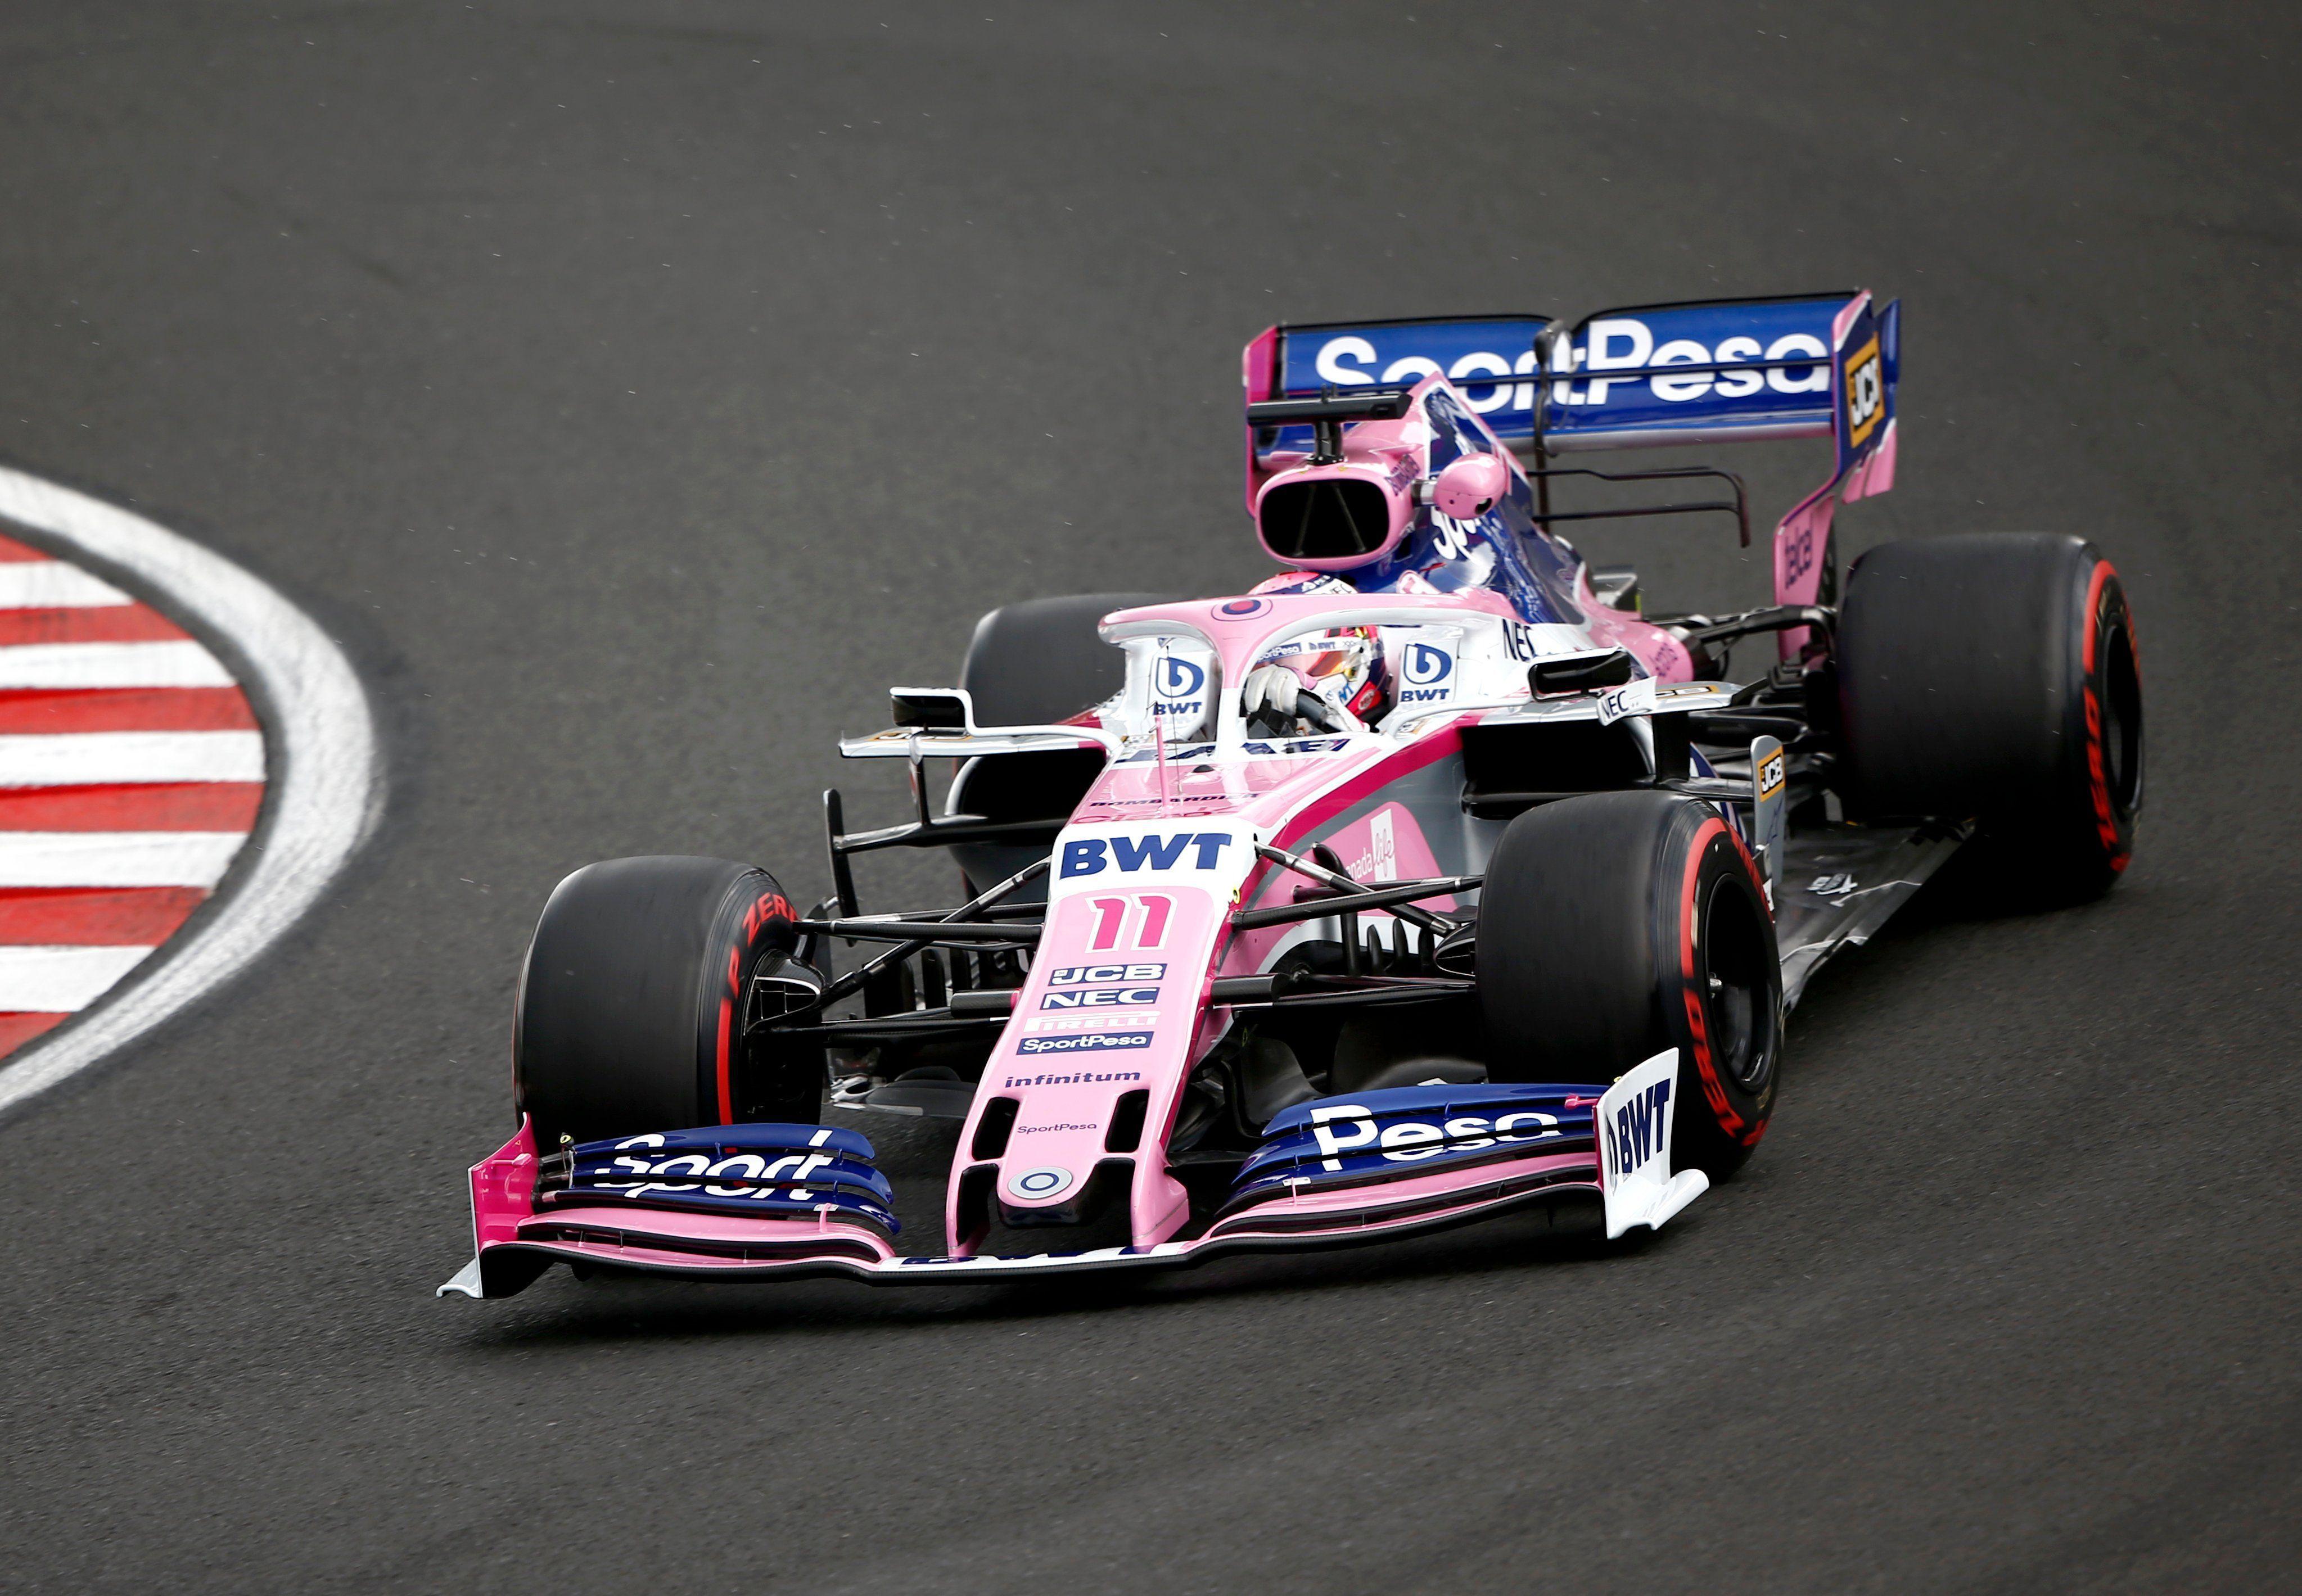 SportPesa, Racing Point, F1